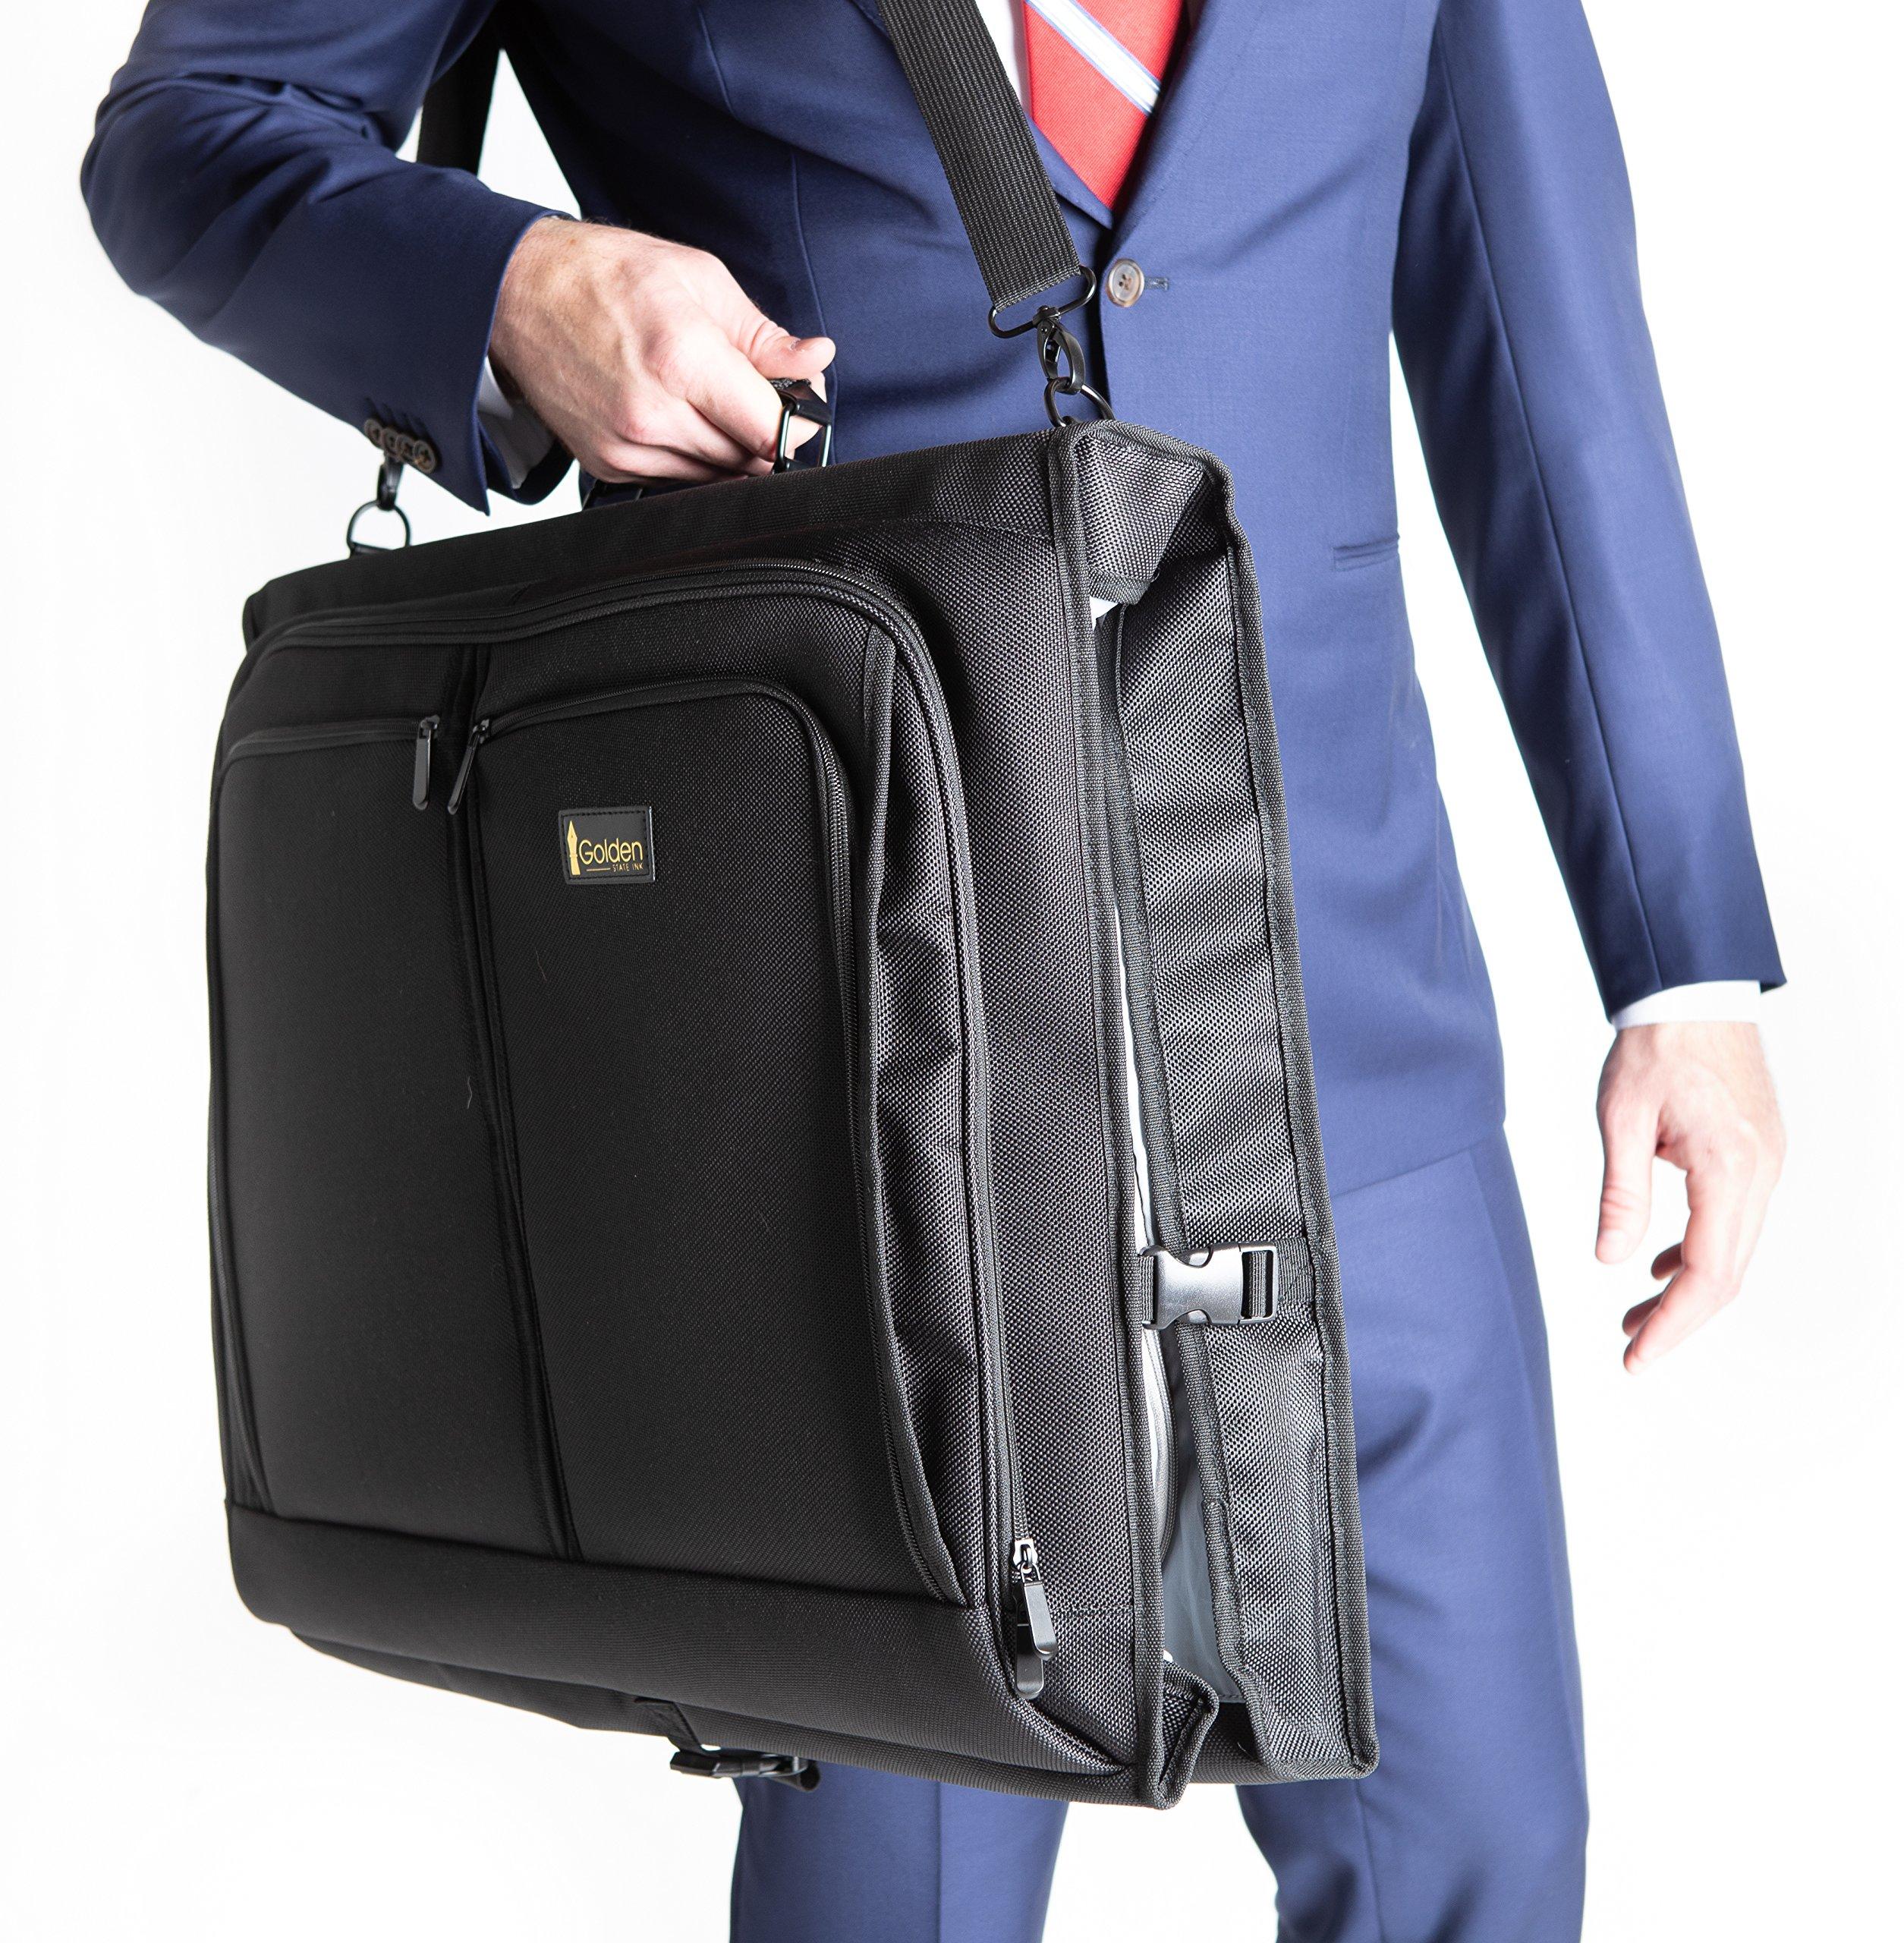 Best Garment Bag - Black Carry On Suit Bag Dress Bag for Travel & Business Trips -w/Hanging Hook & Shoulder Strap- for Men and Women - Folding Wardrobe Carrier Luggage by Golden State Ink by Golden State Ink